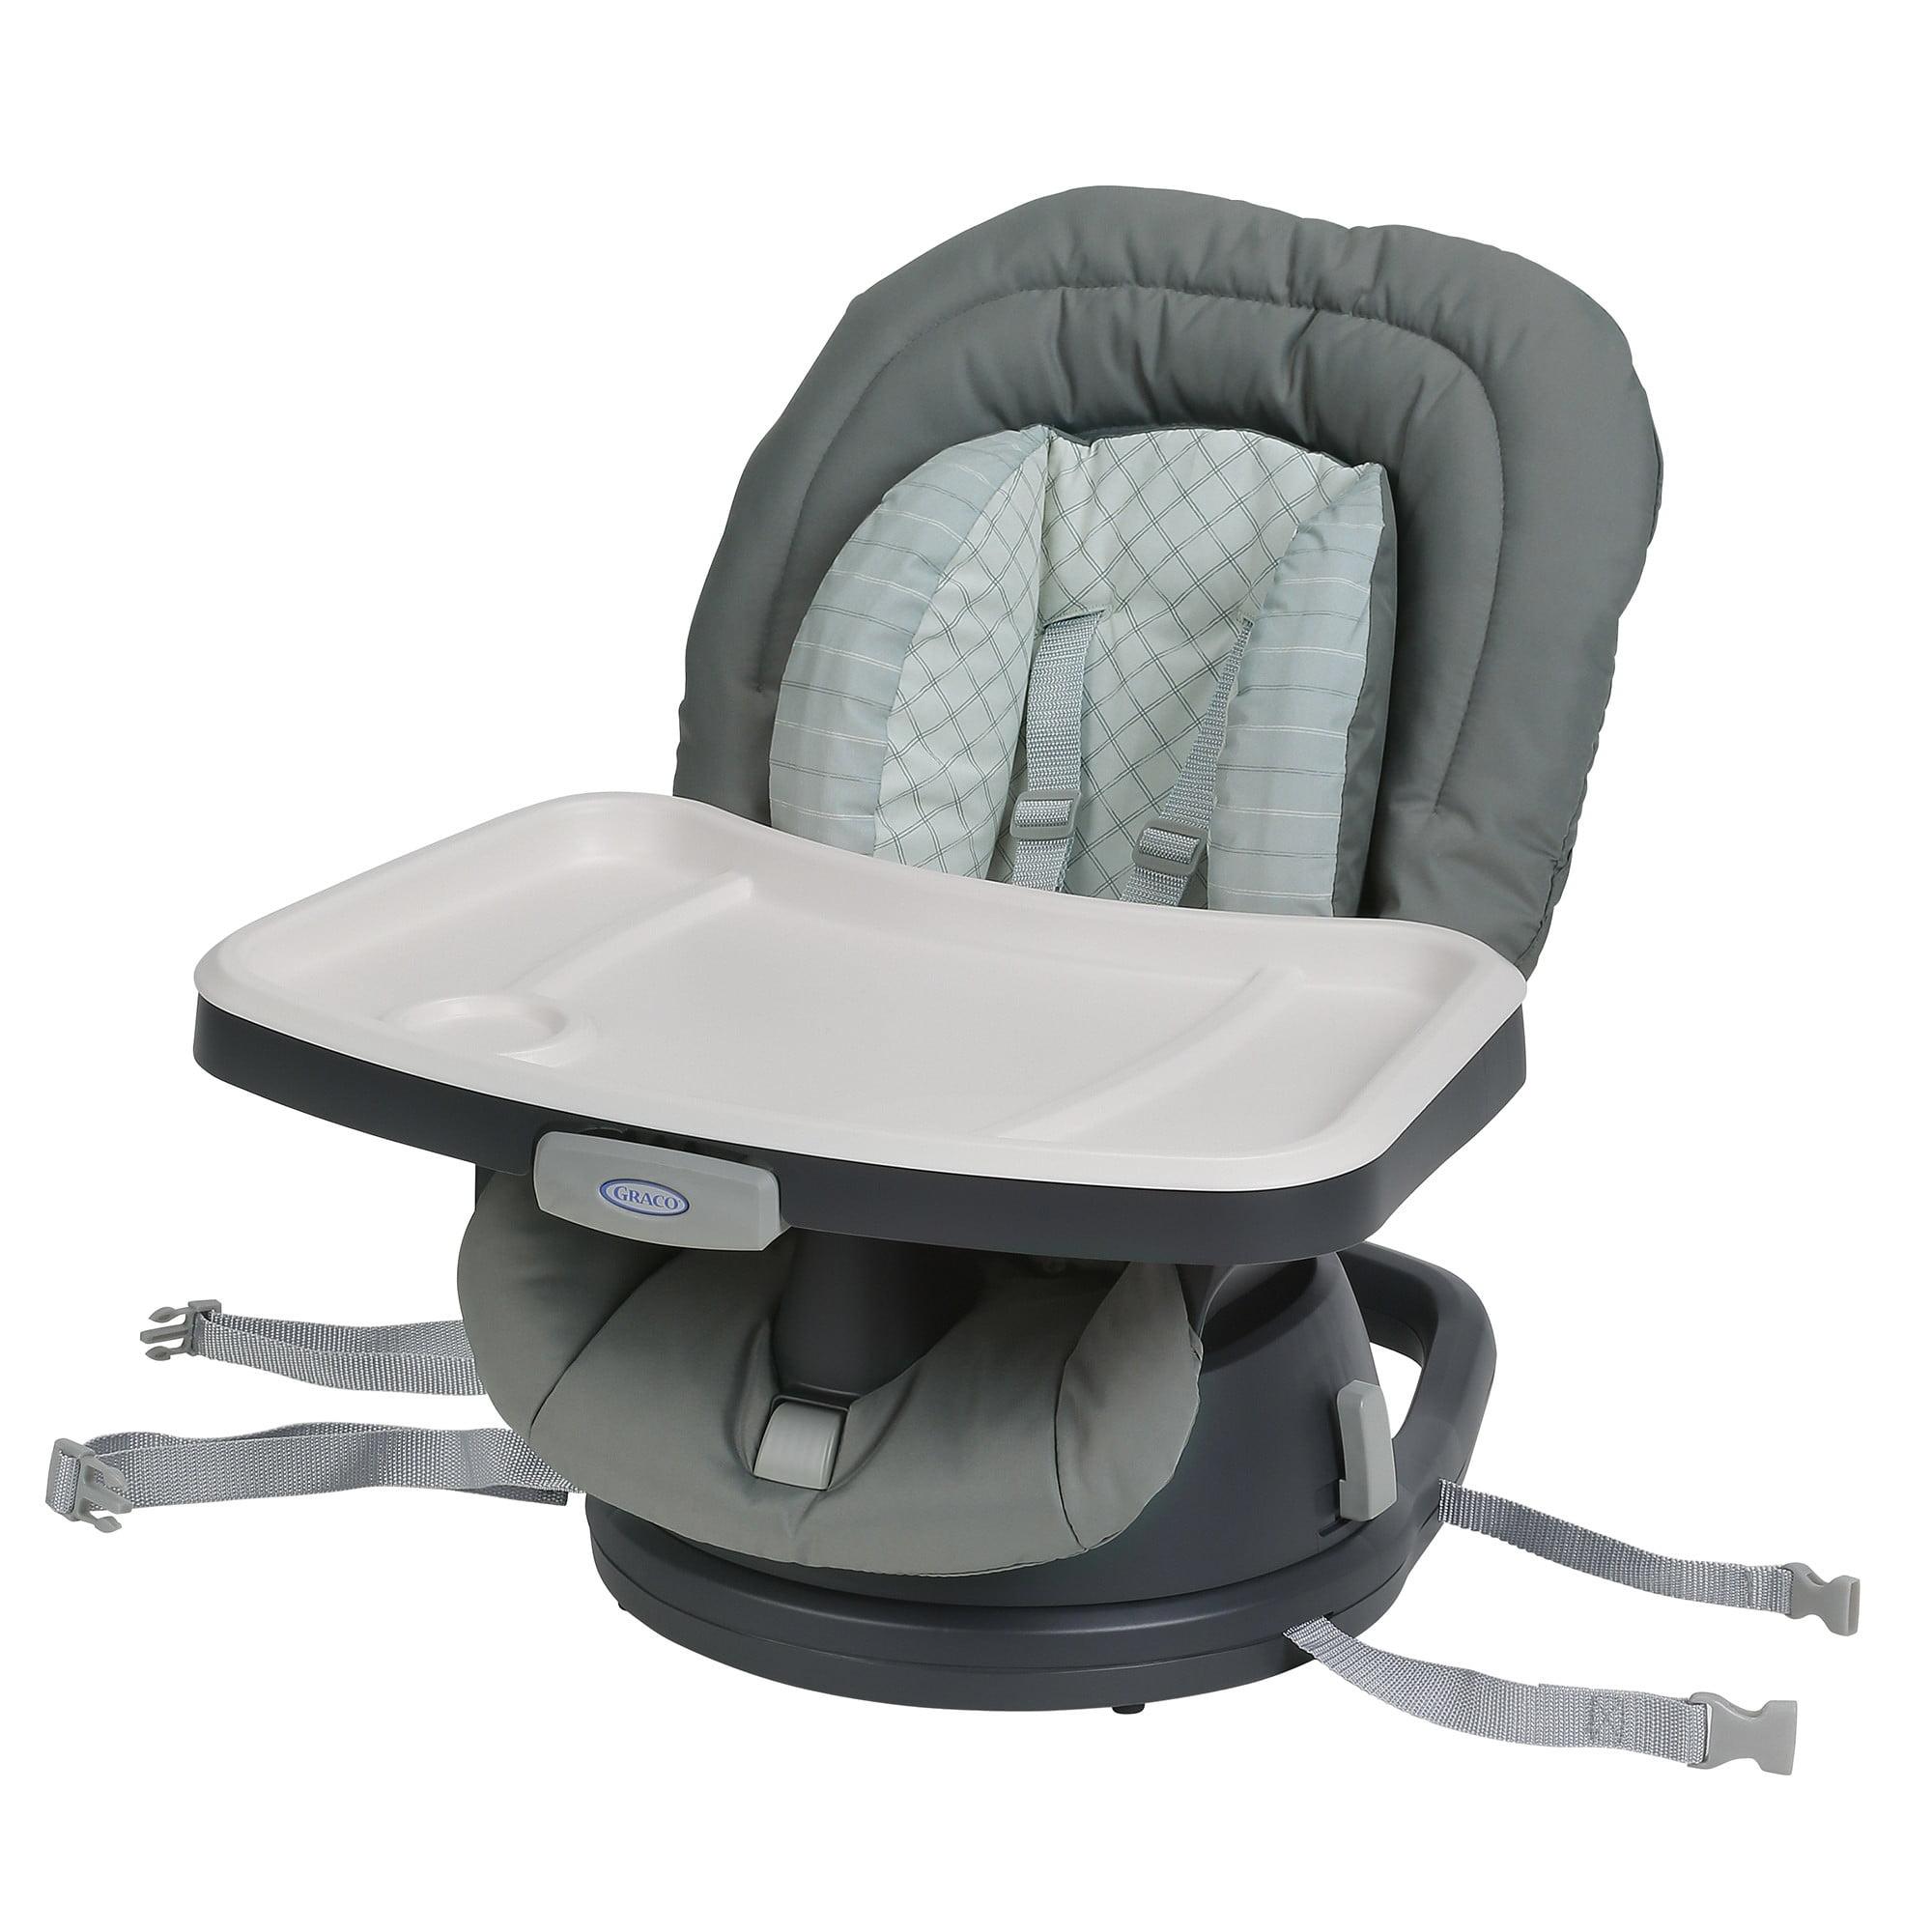 Graco® SwiviSeat™ Booster Seat, Brinley